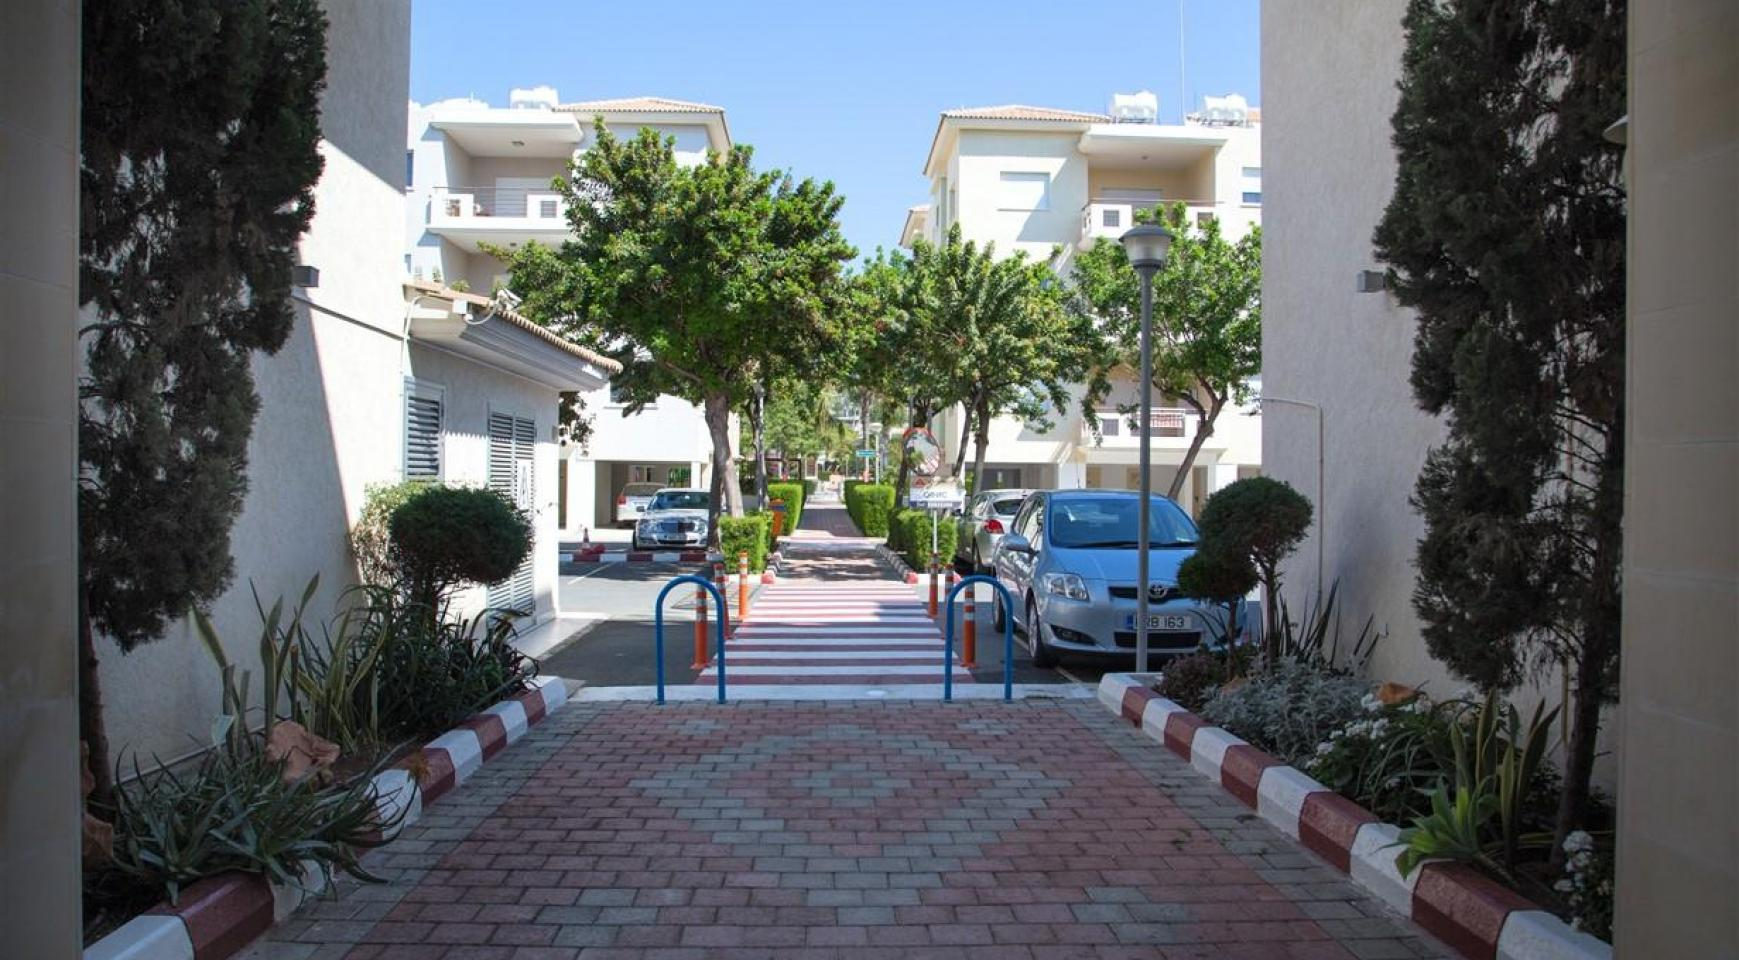 Luxury 2 Bedroom Apartment Mesogios Iris 304 in the Tourist area near the Beach - 43